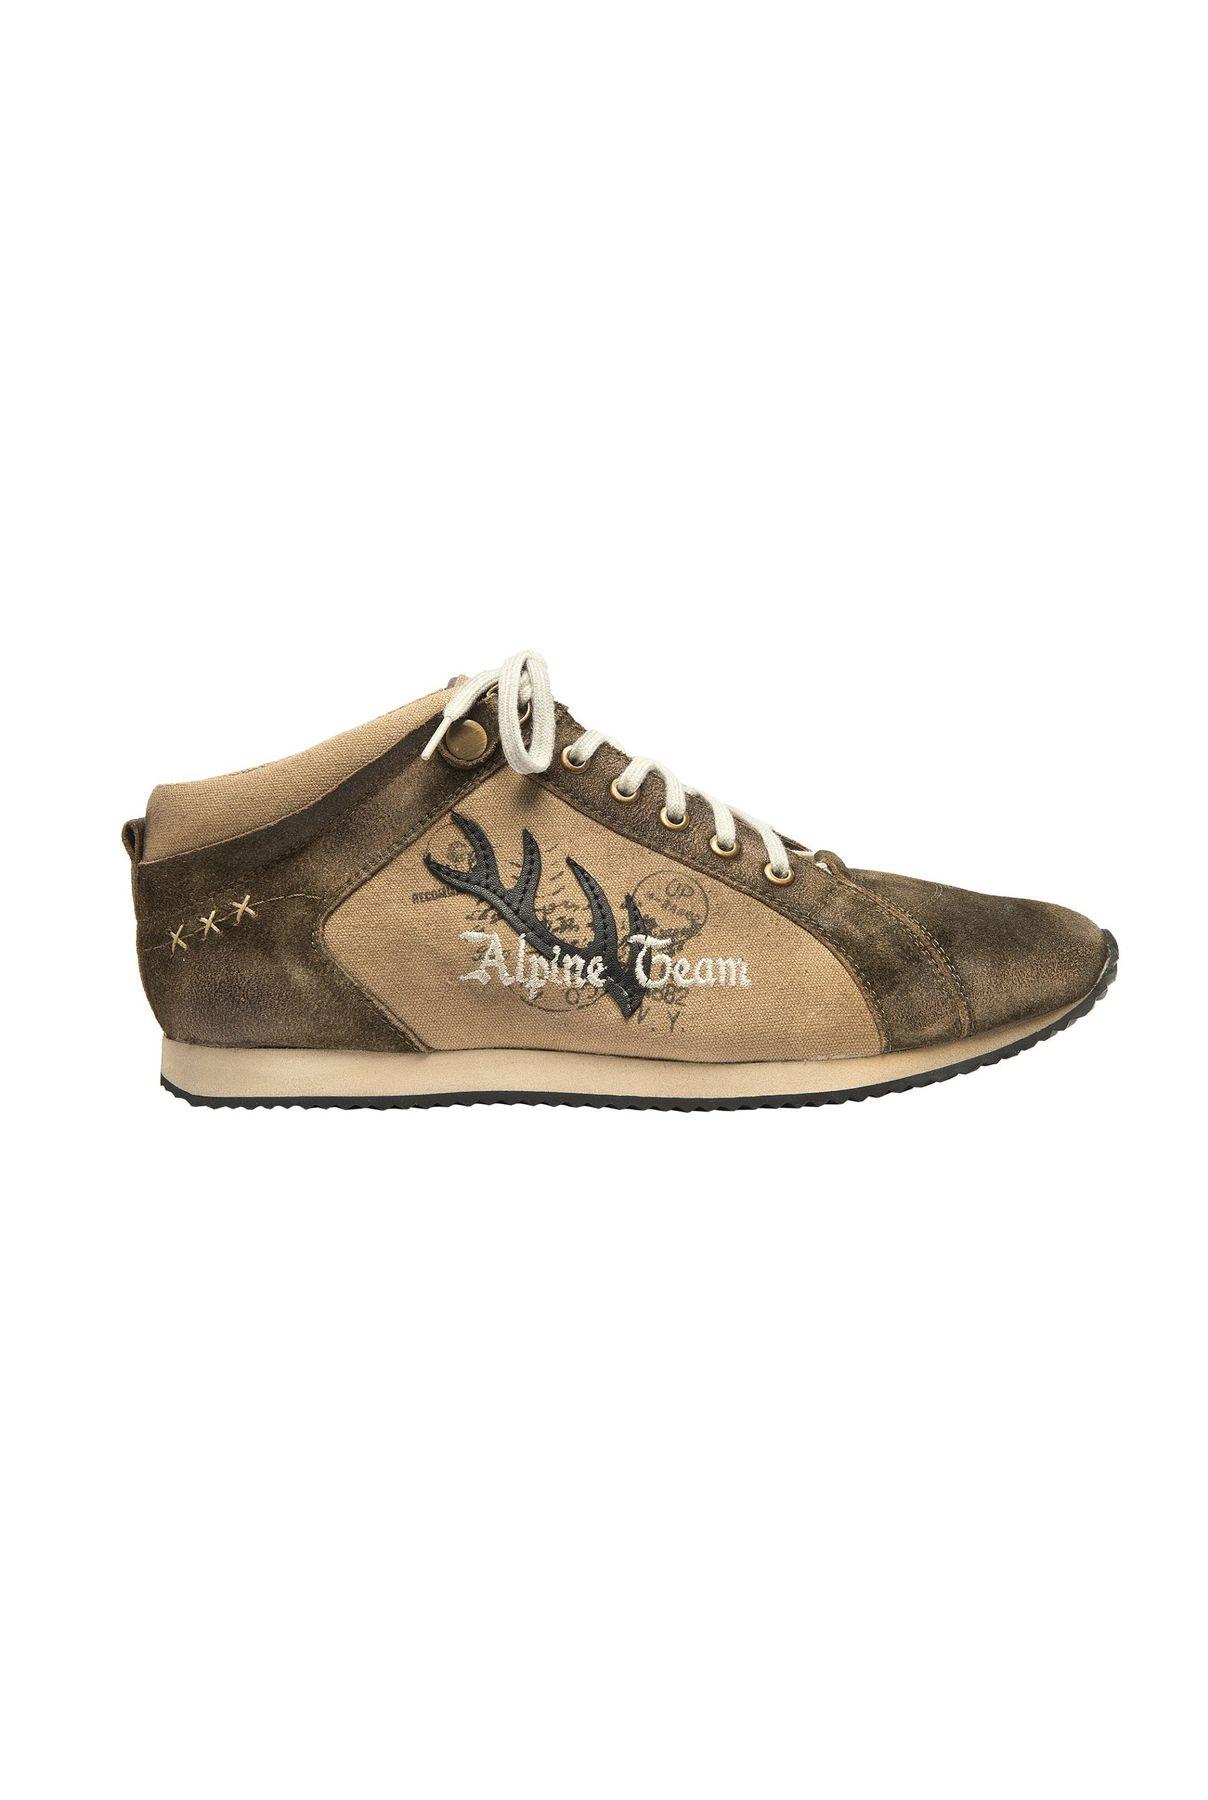 STOCKERPOINT - Herren Trachten Sneaker in Bison gespeckt, 1307 – Bild 4